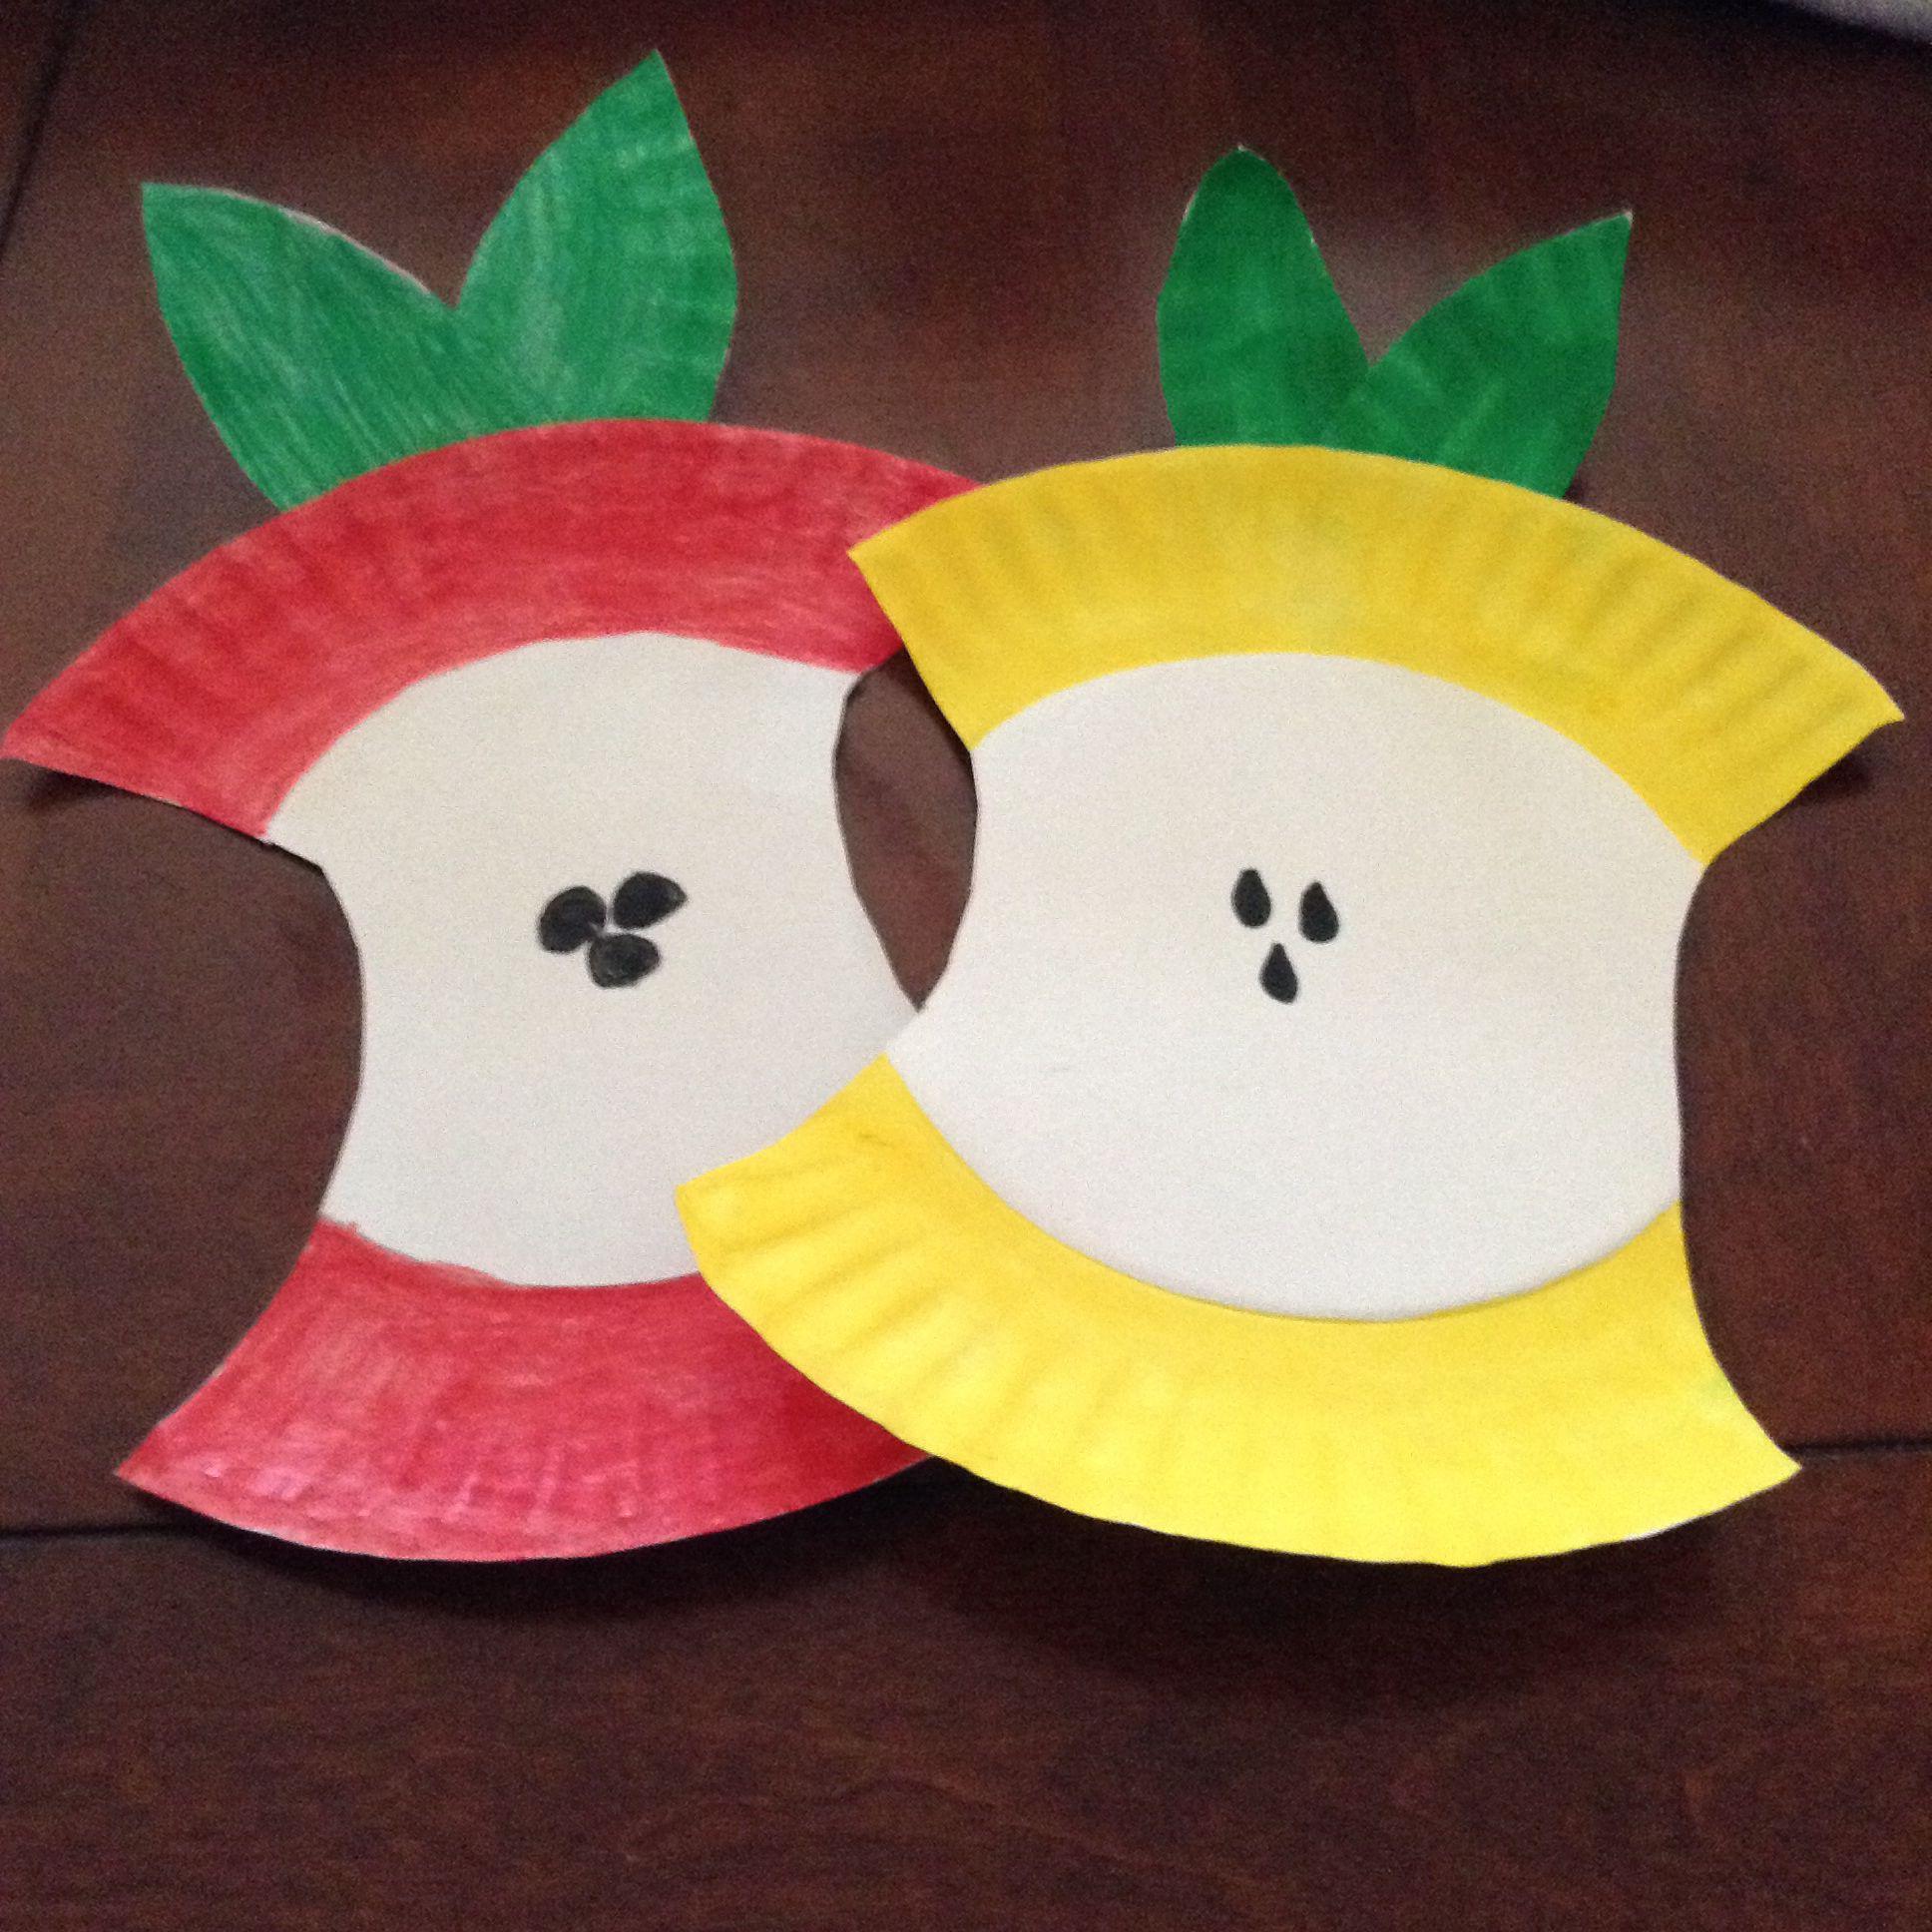 Apples Lesson Fruits Of Spirit